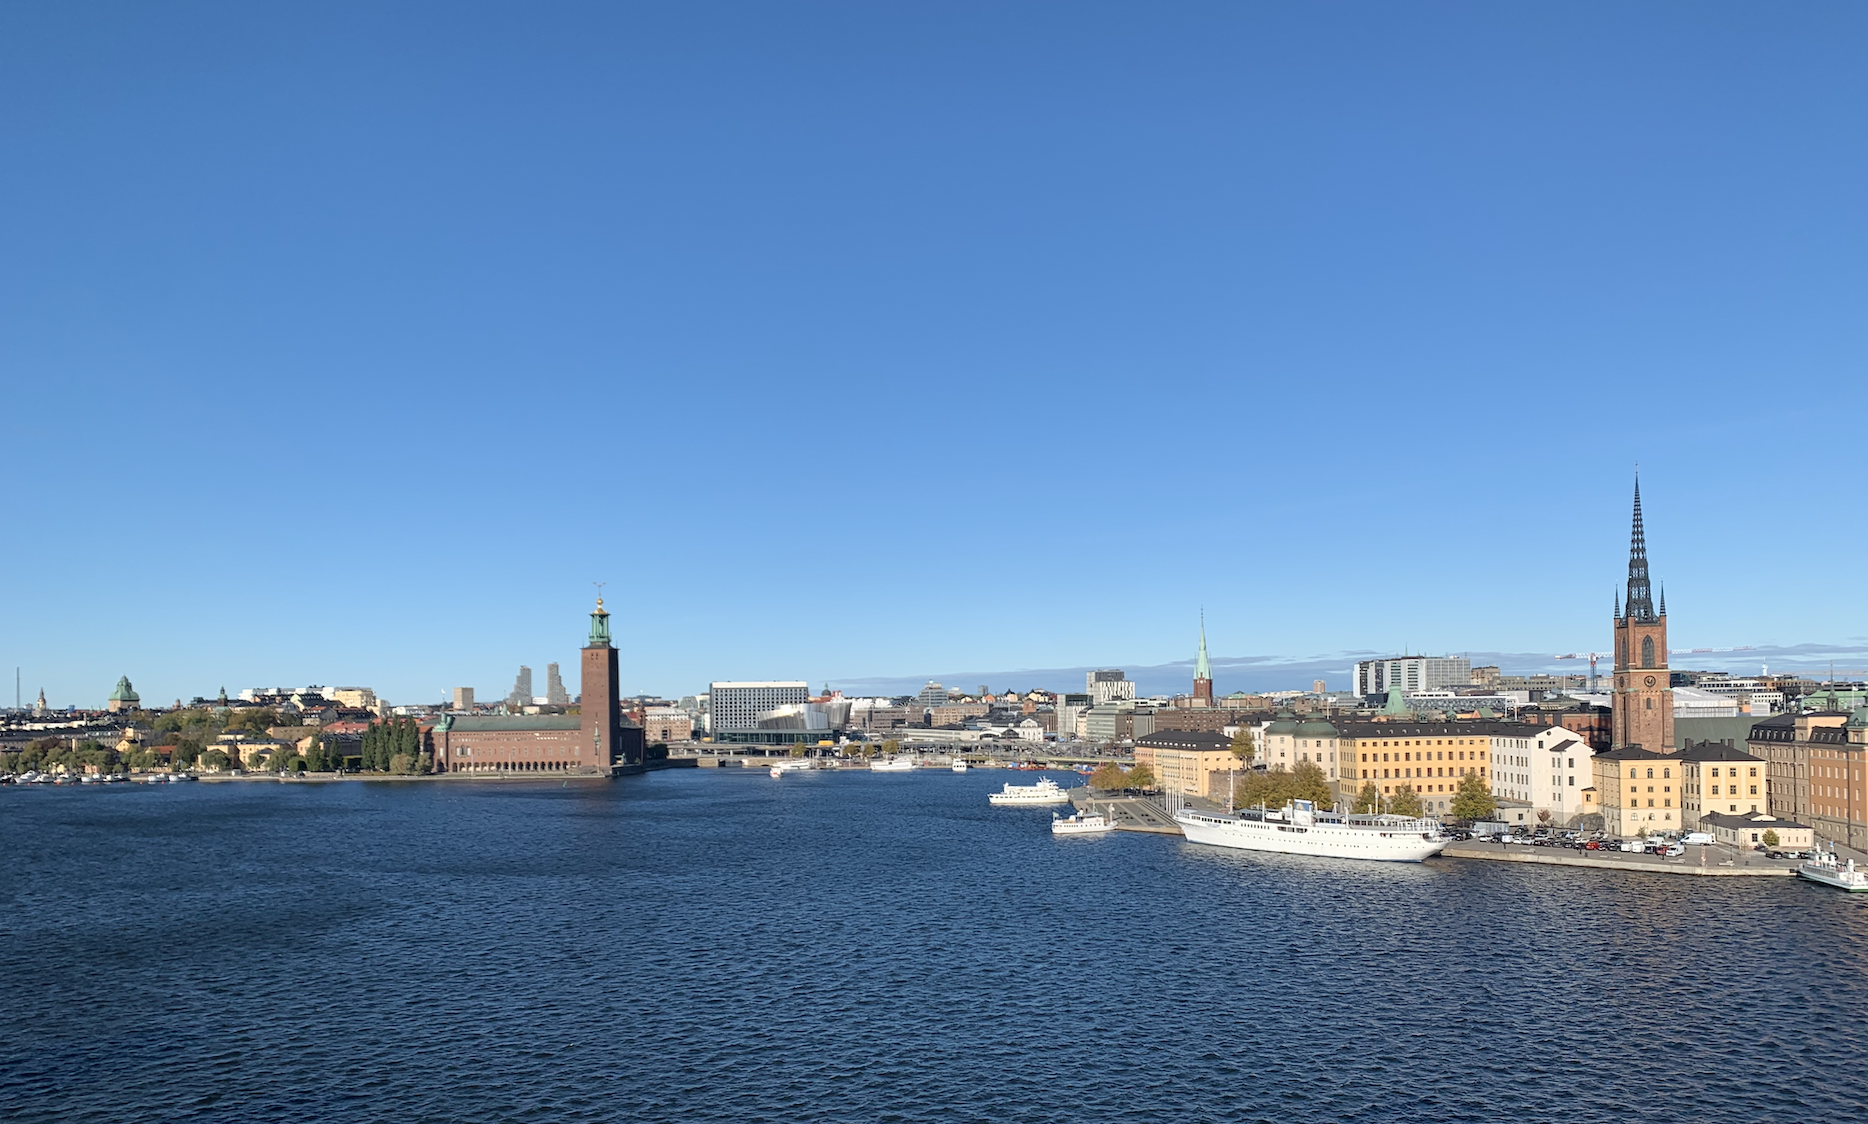 vue sur riddarholmen et kungsholmen depuis le sentier monteliusvagen